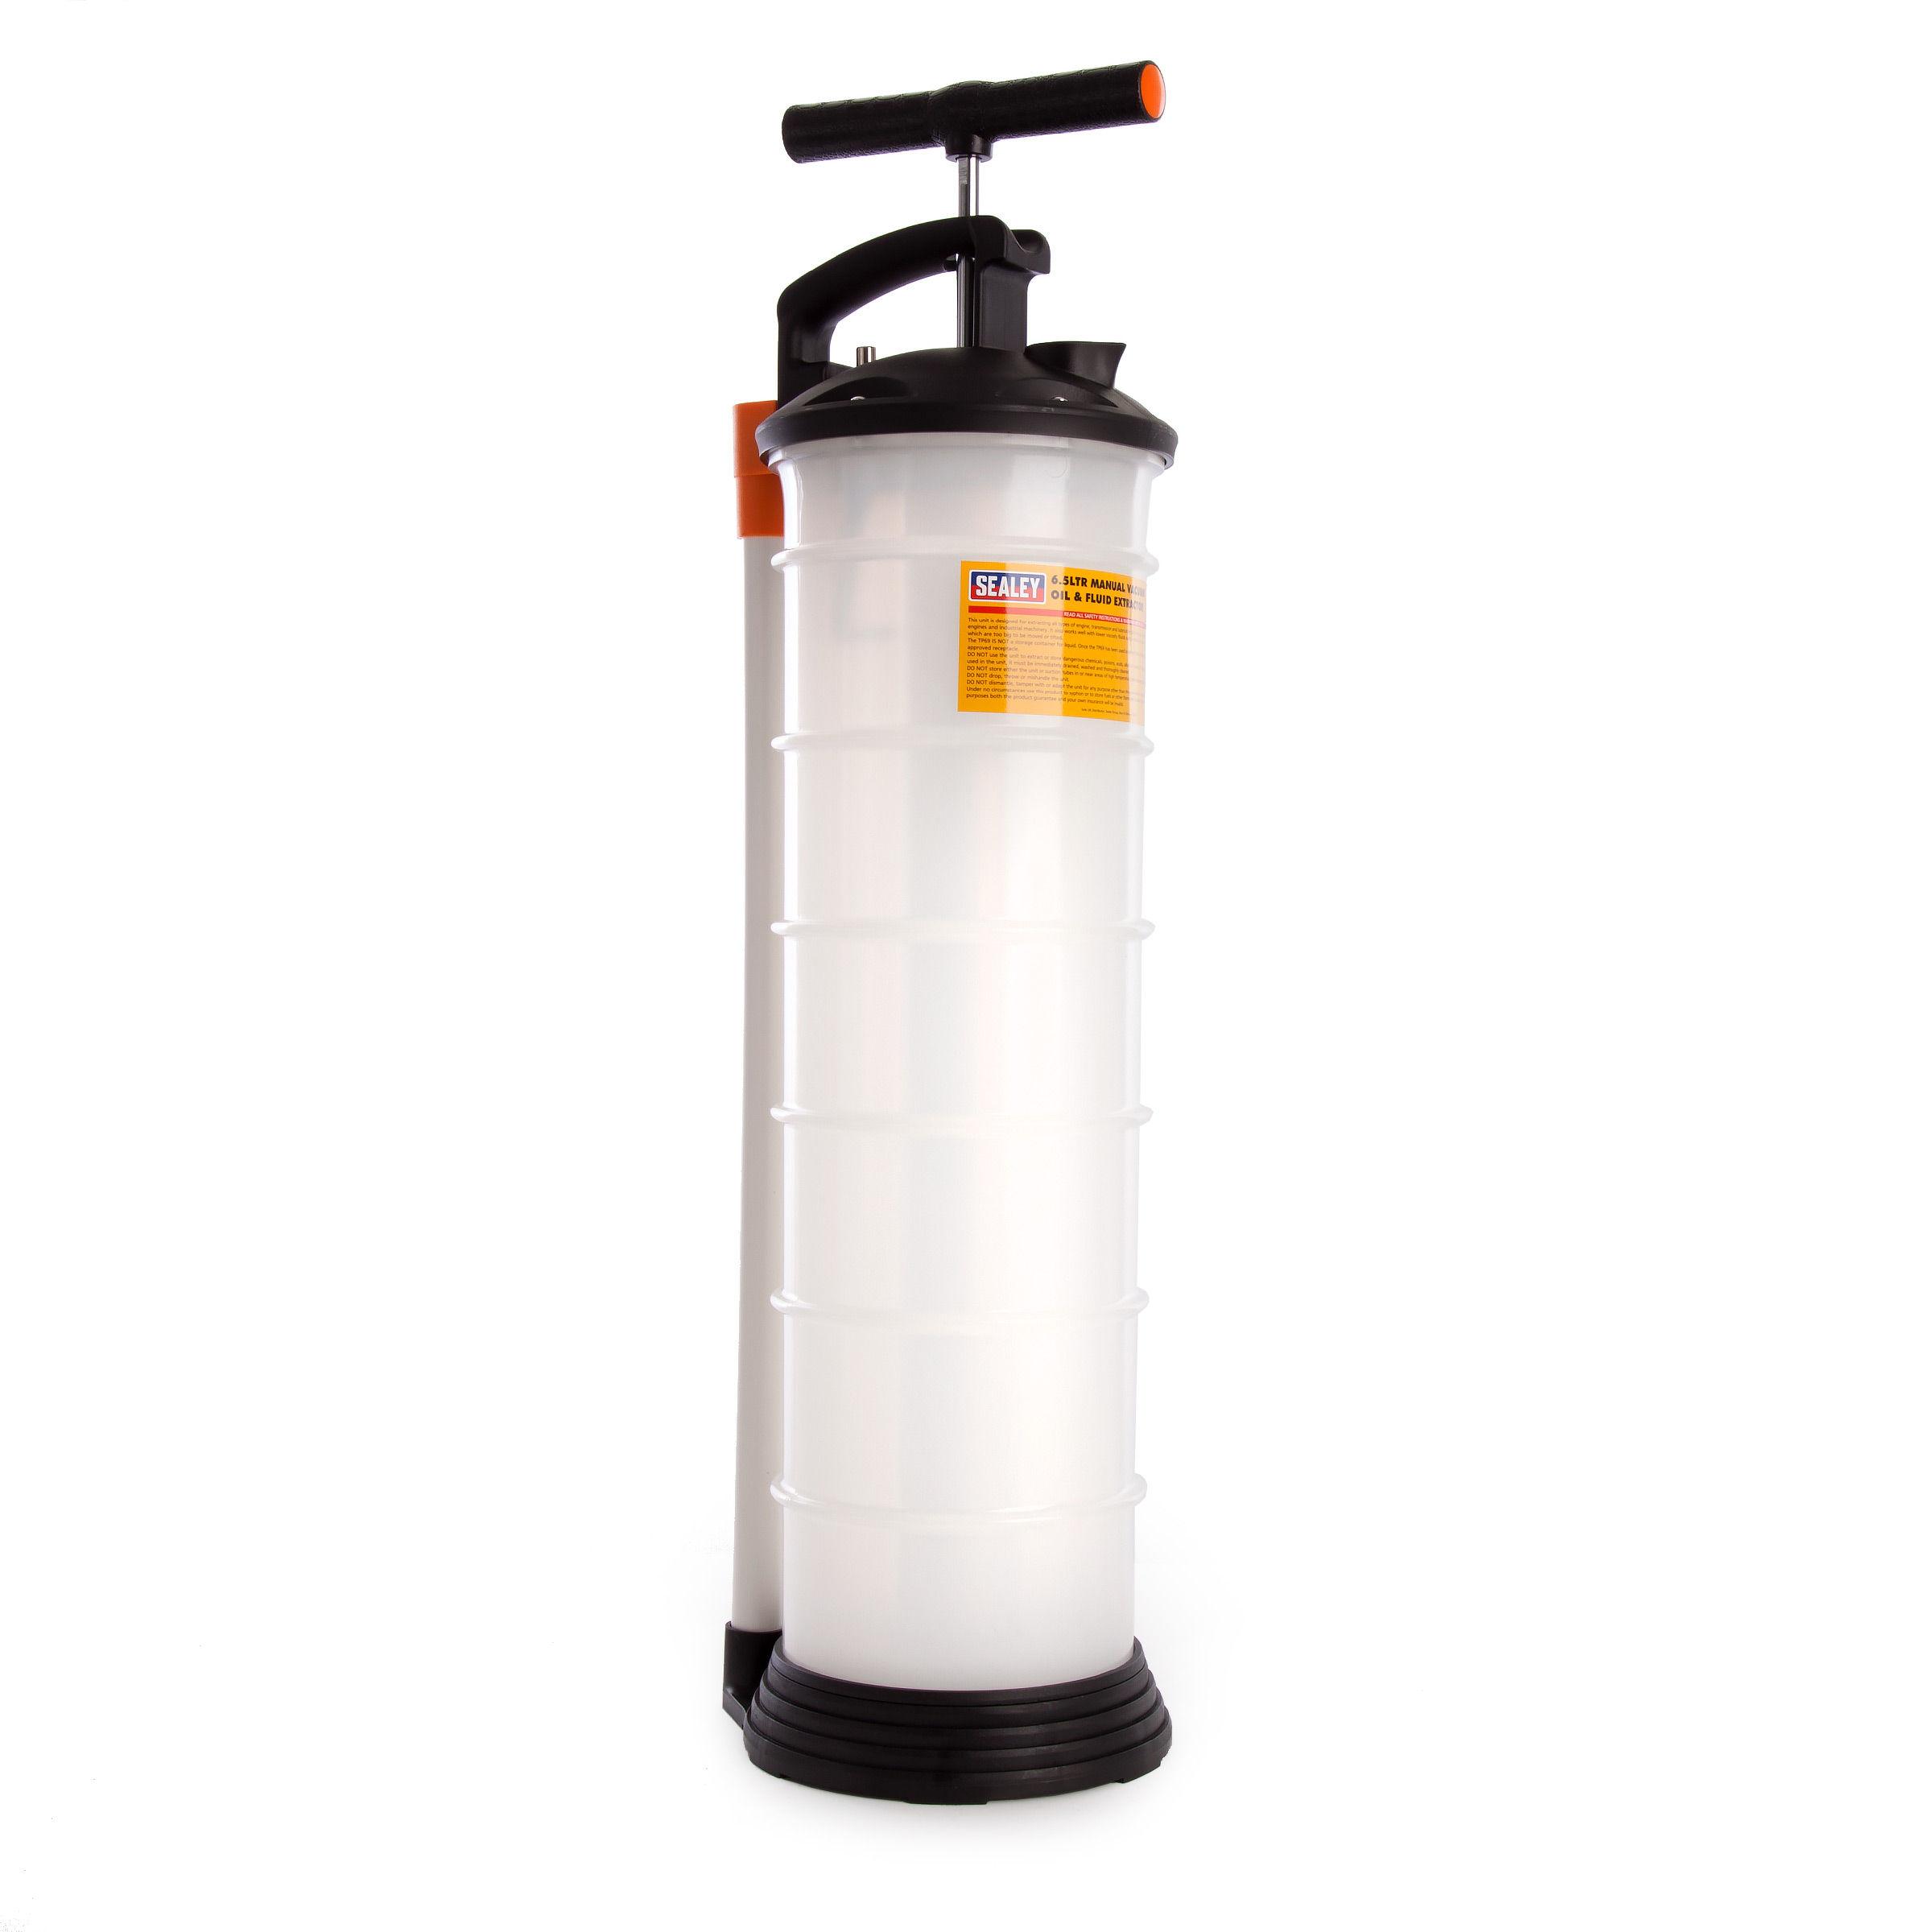 Sealey TP69 Vacuum Oil & Fluid Extractor Manual 6 5 Litres